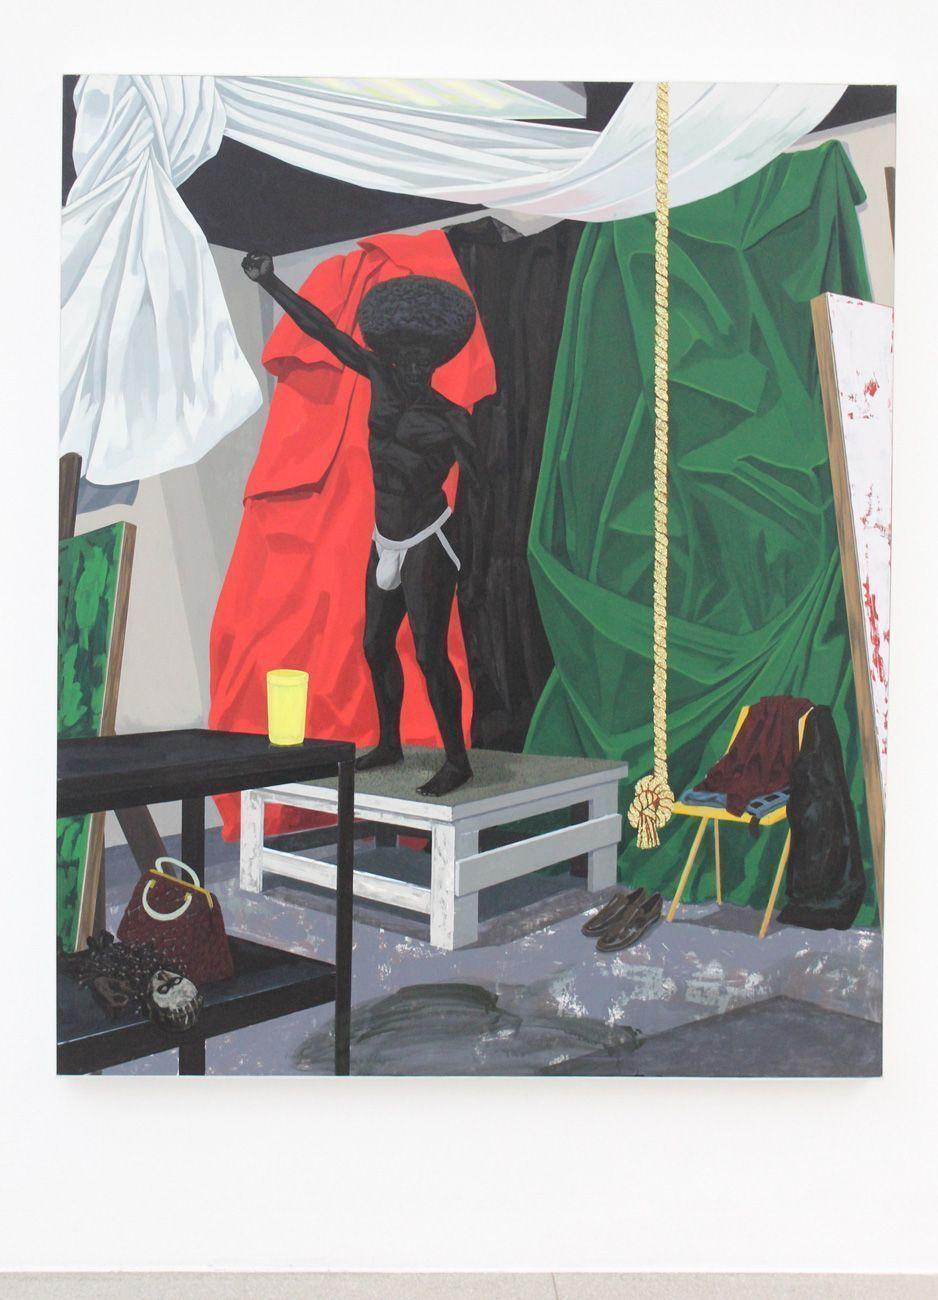 Kerry James Marshall, The Academy, 2012, Acryl auf Leinwand, 185 x 155 cm, Foto: Alexandra Matzner.